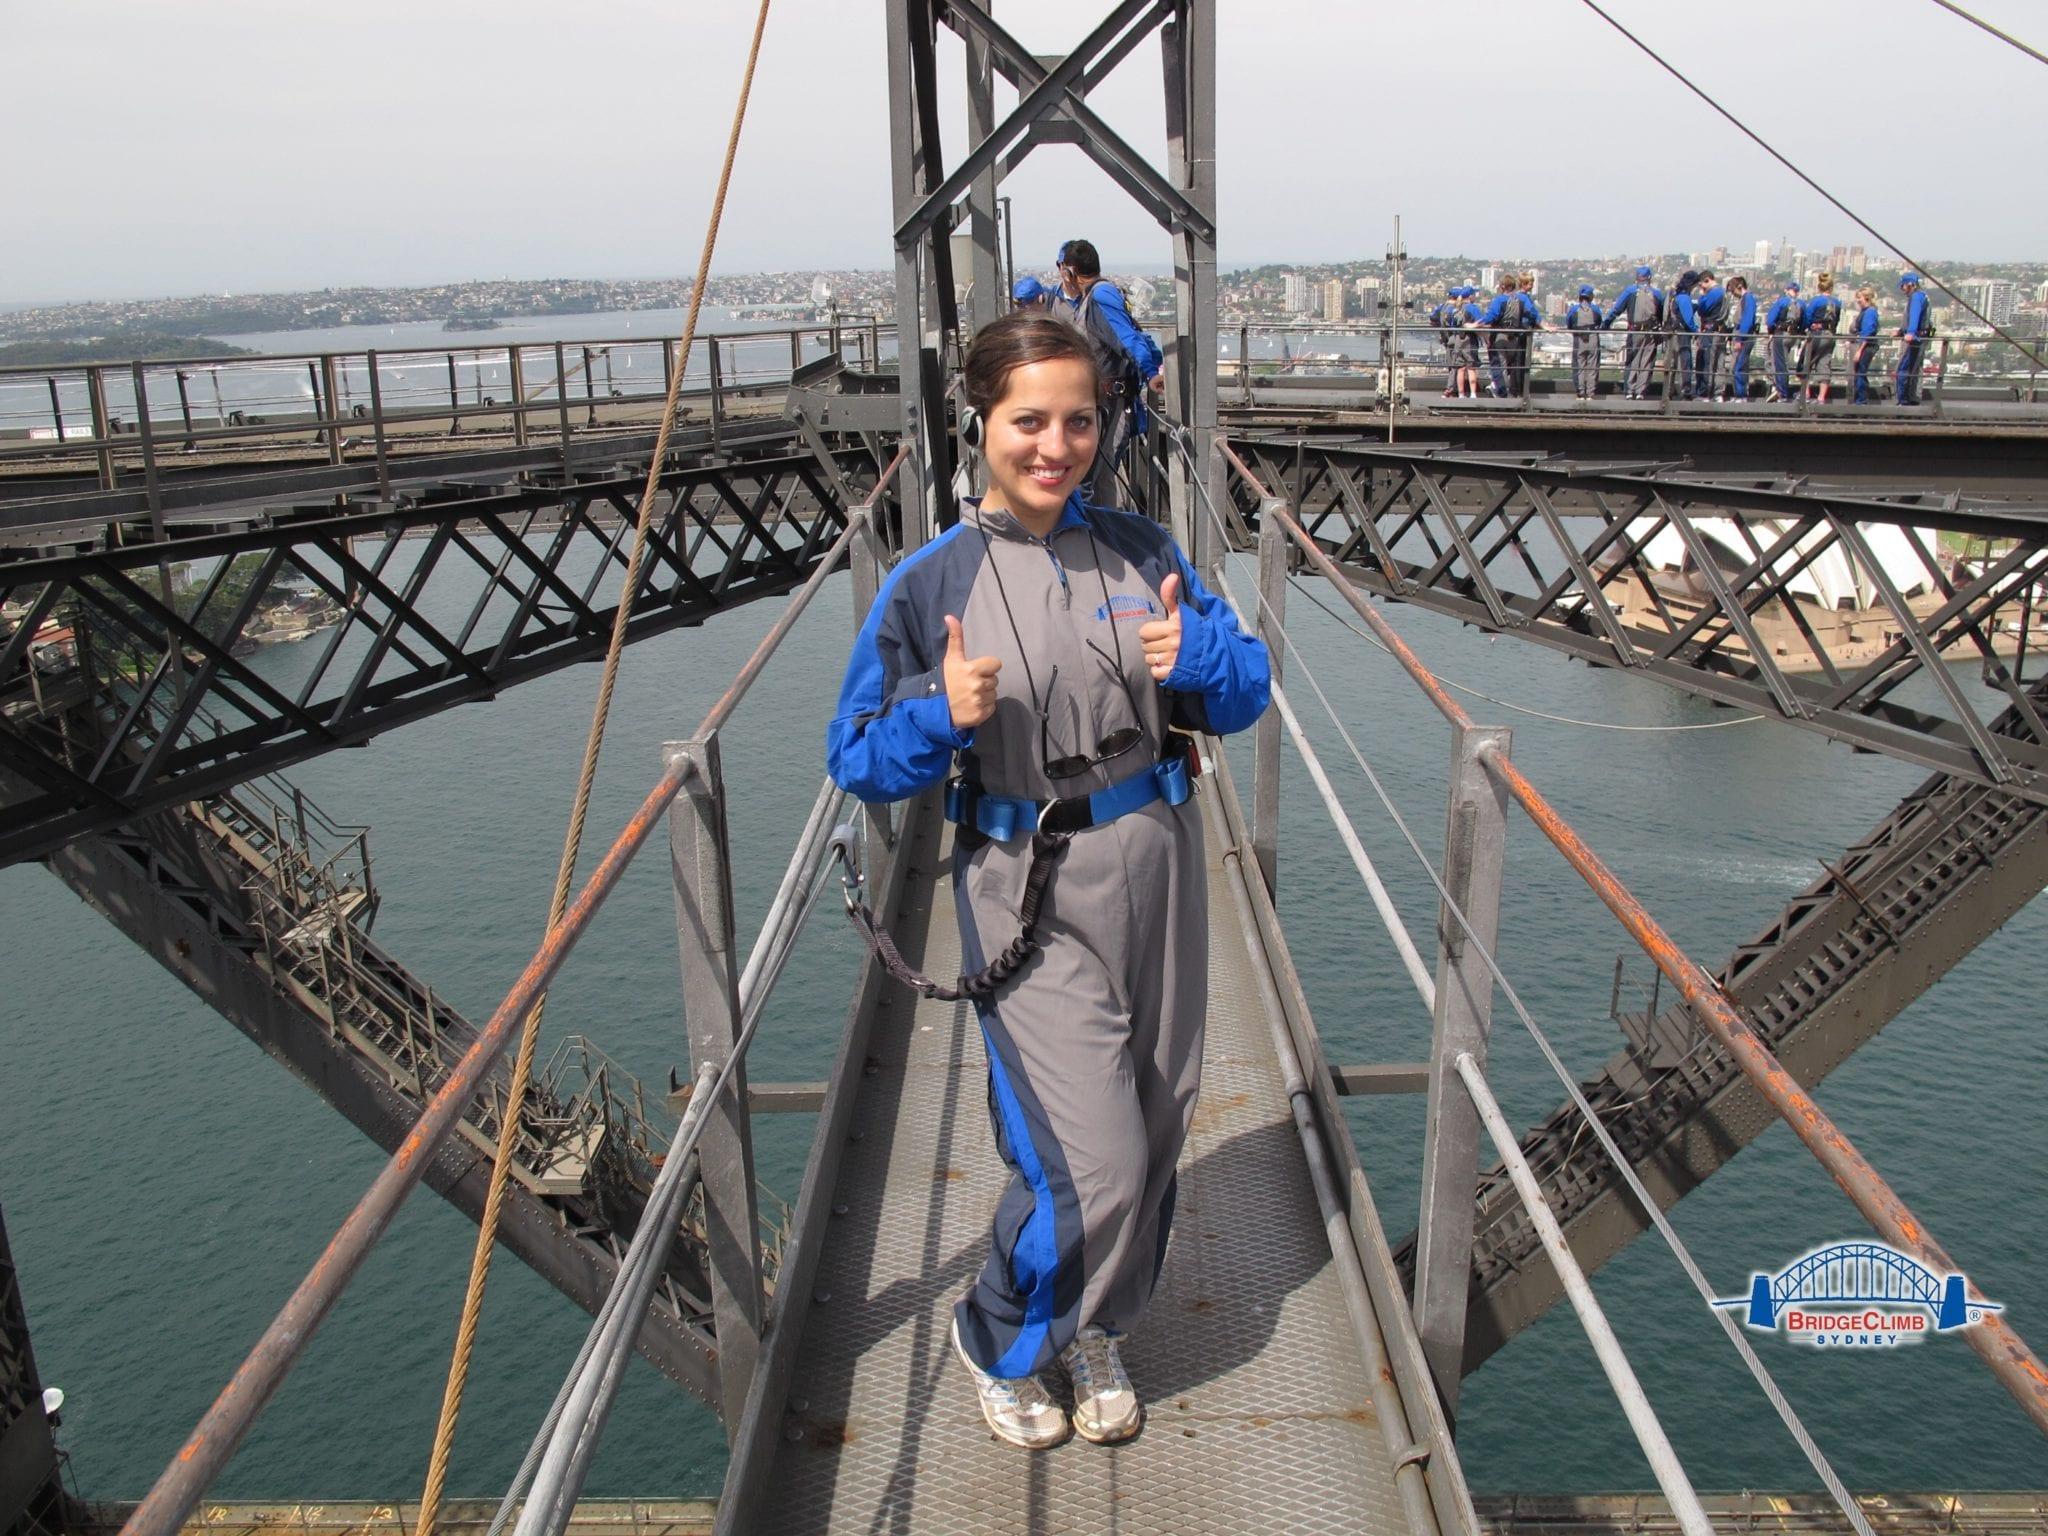 Top 10 Travel Safety Tips for Women - Adventurous Kate : Adventurous